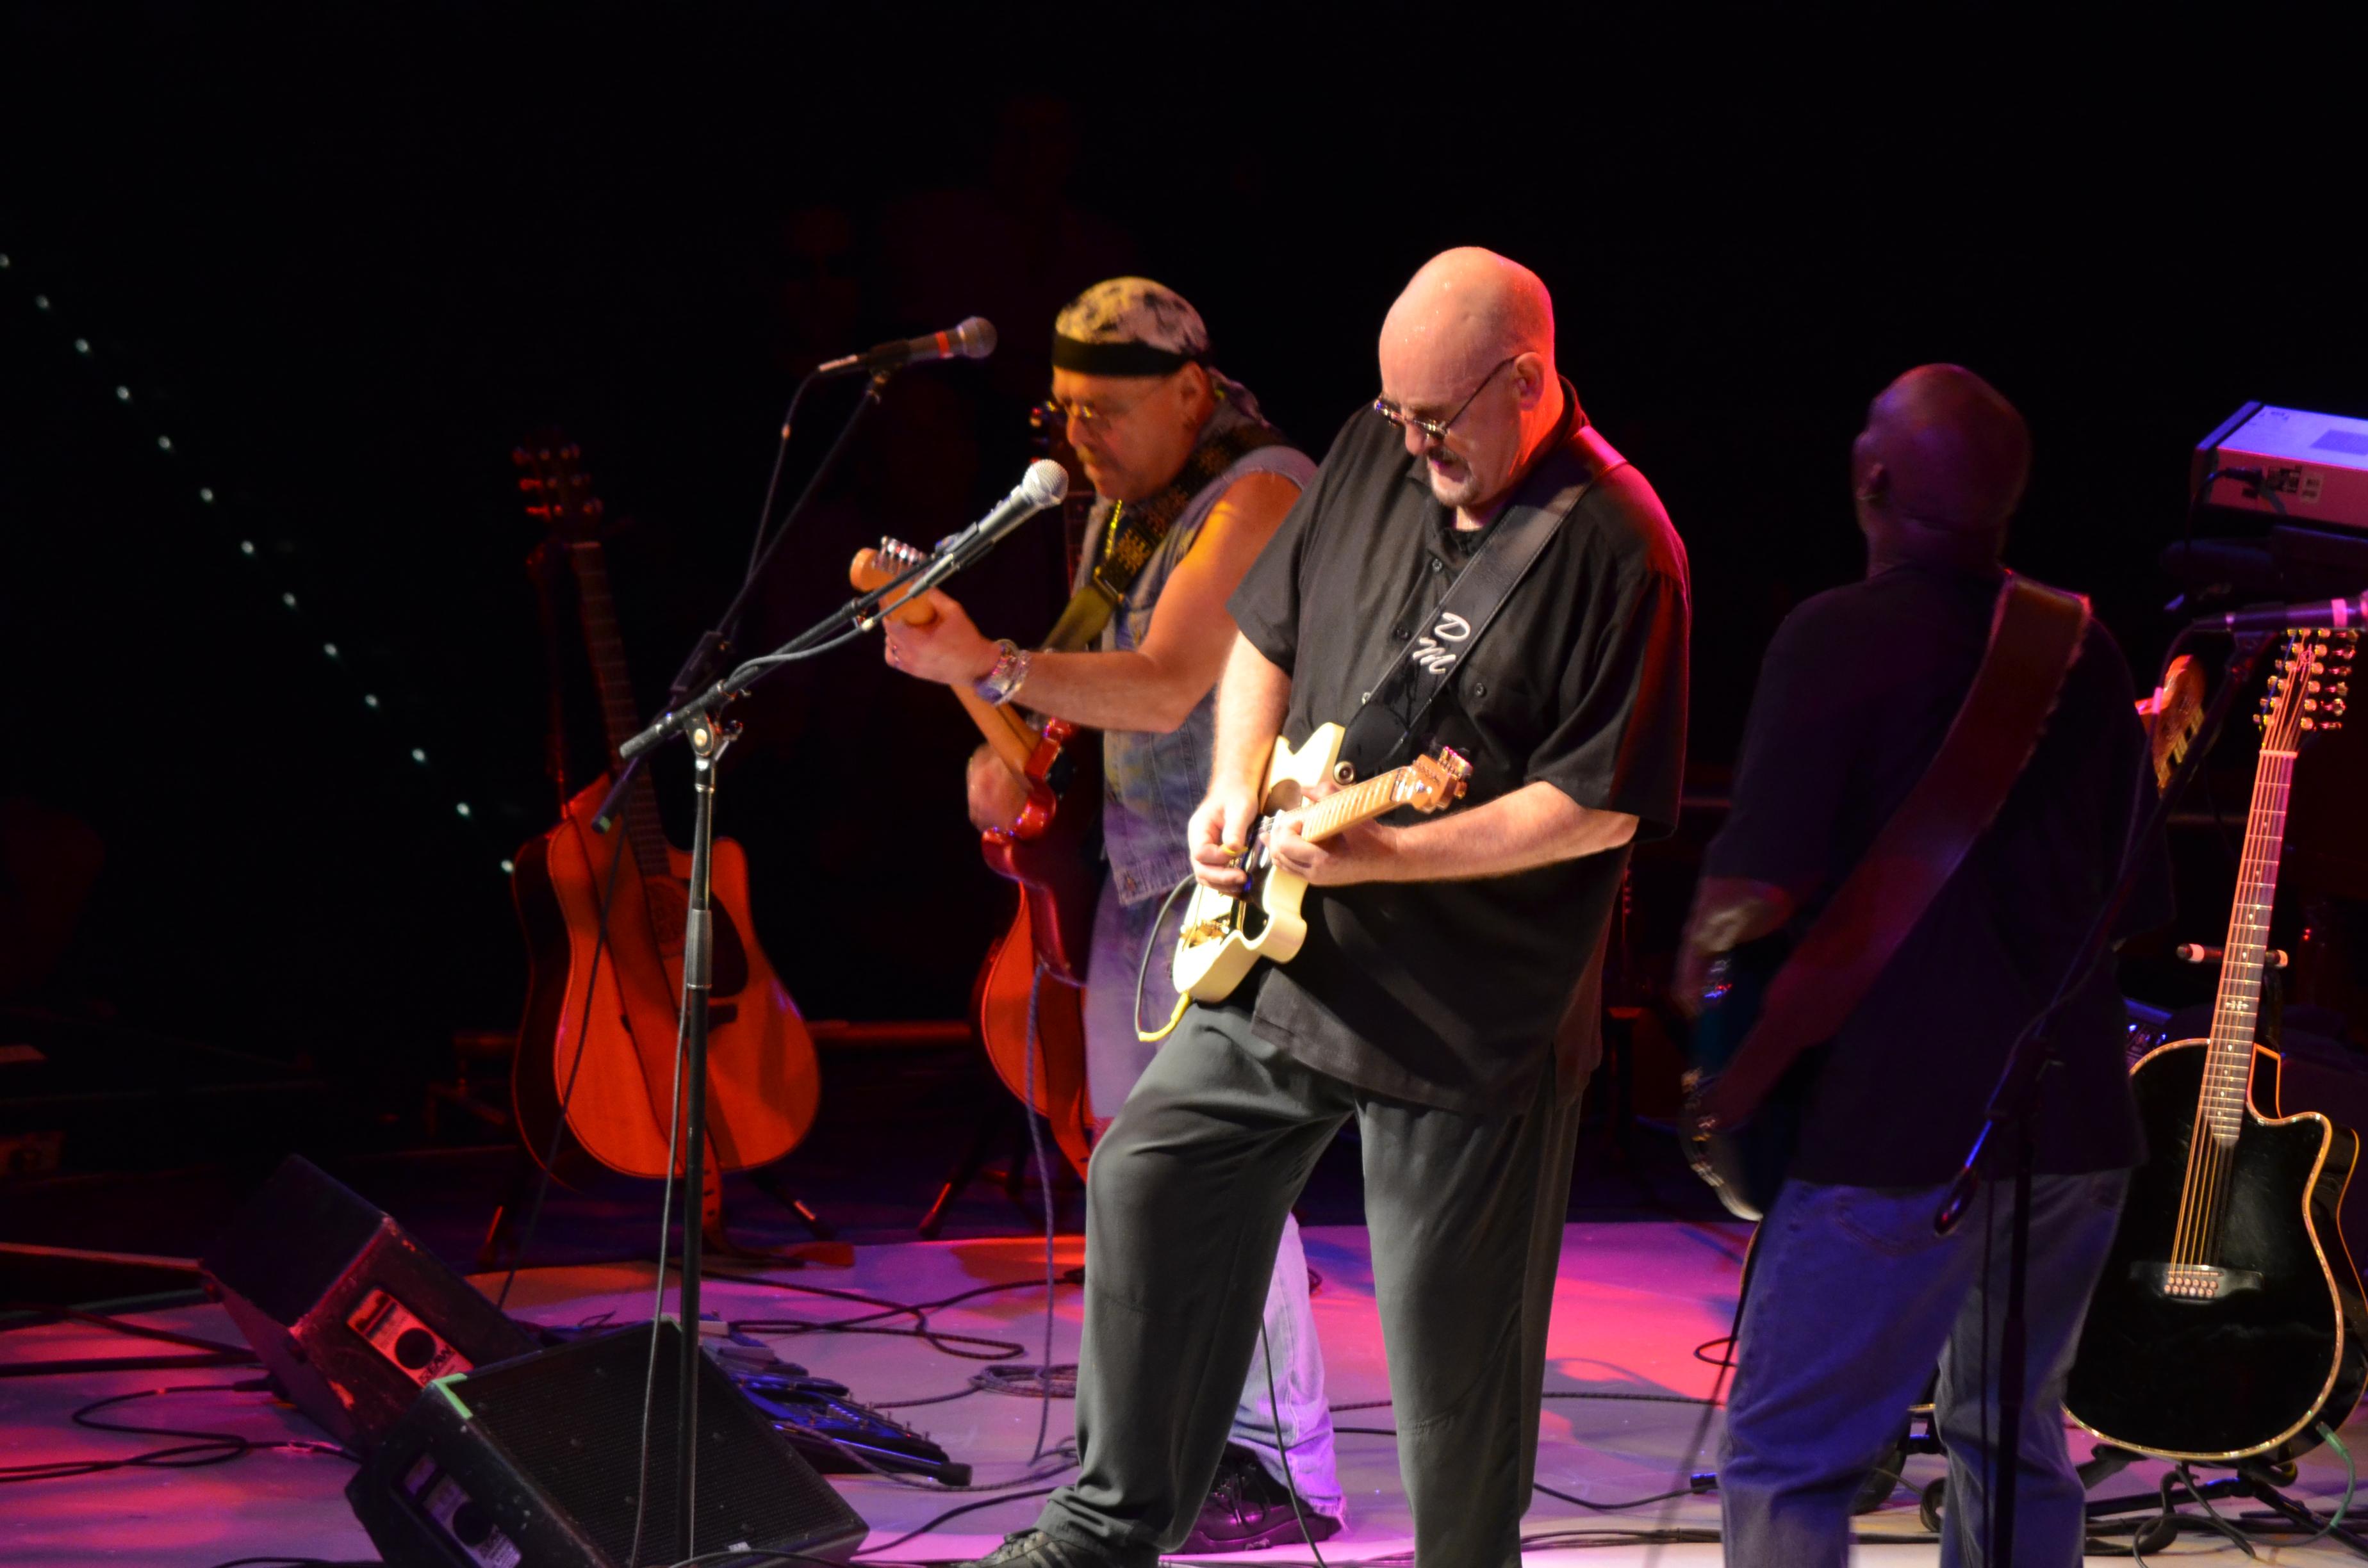 Dave Mason Westbury 09-09-11 #3